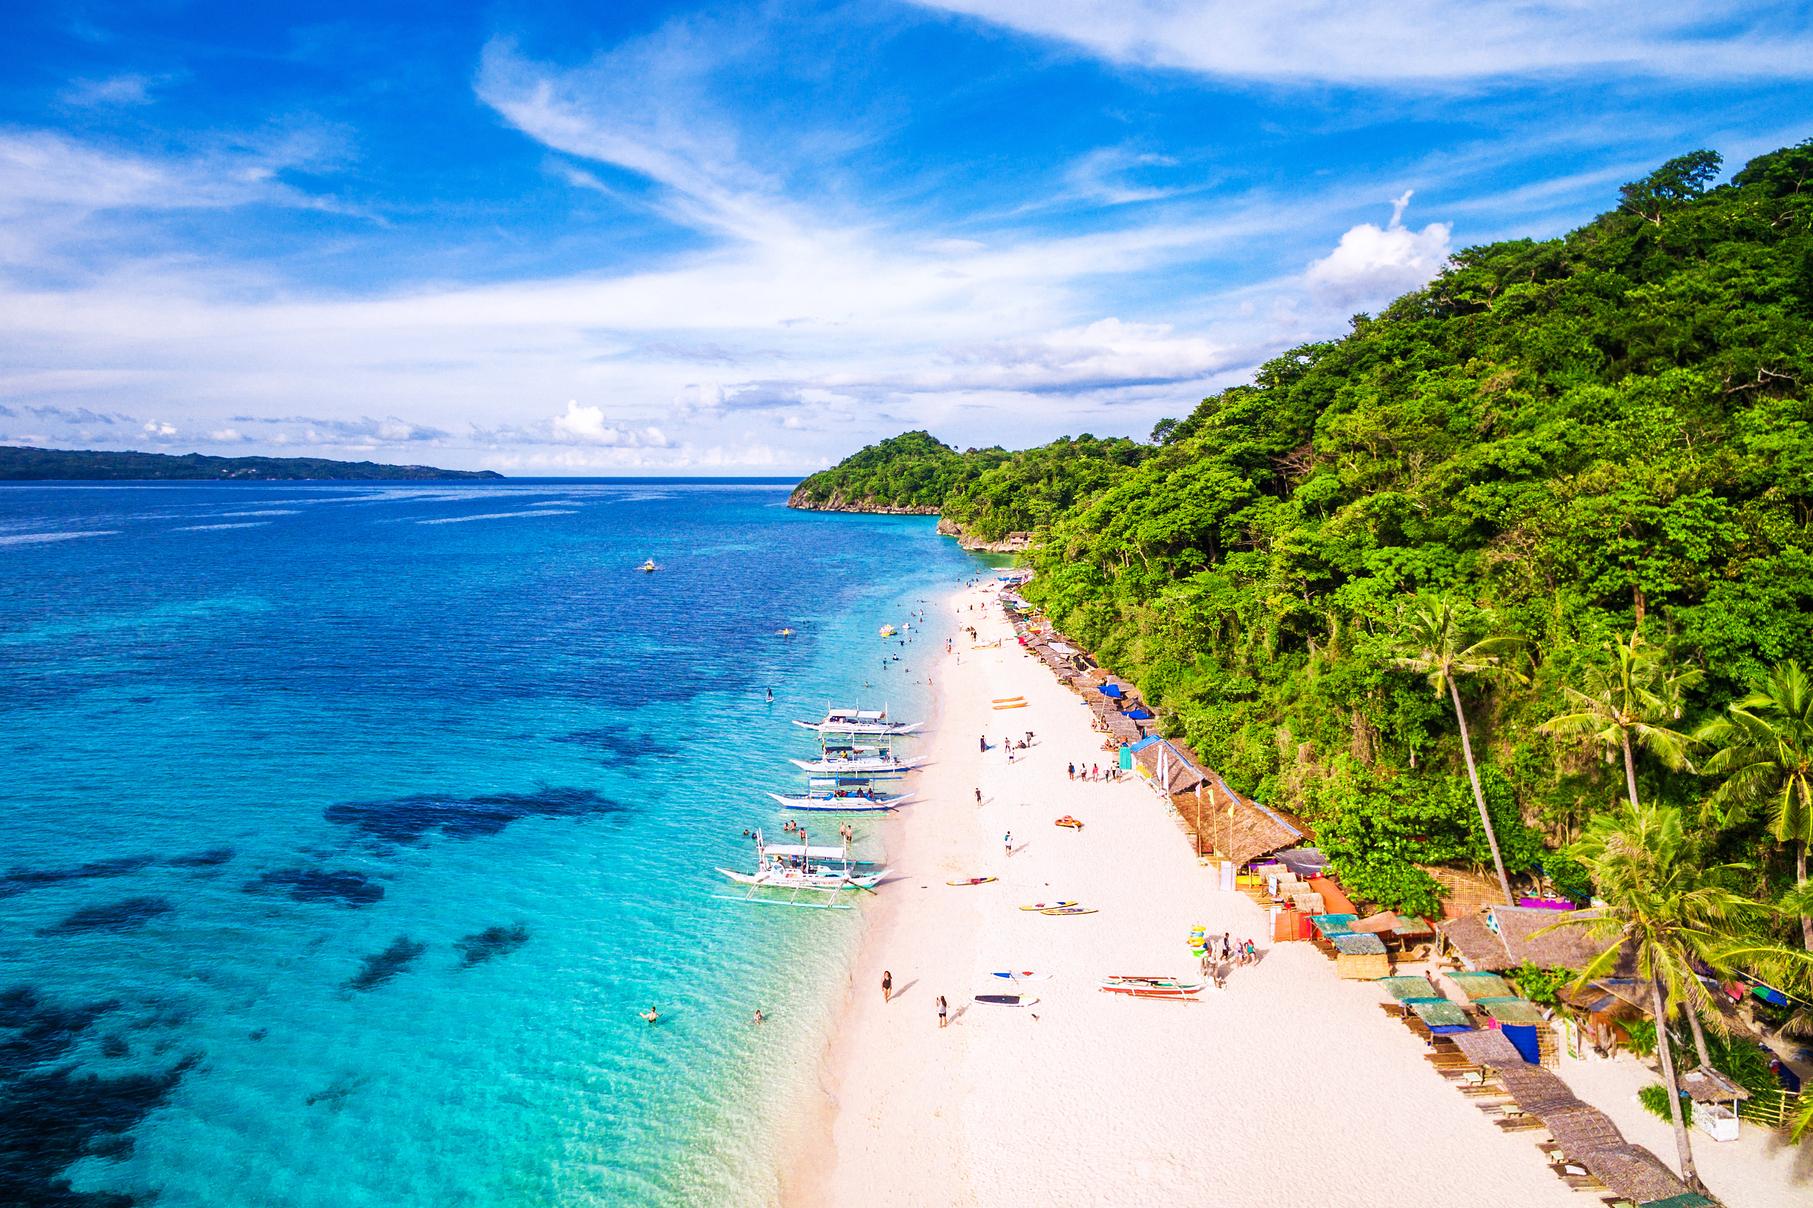 Famous powdery white sand beach of Boracay Island